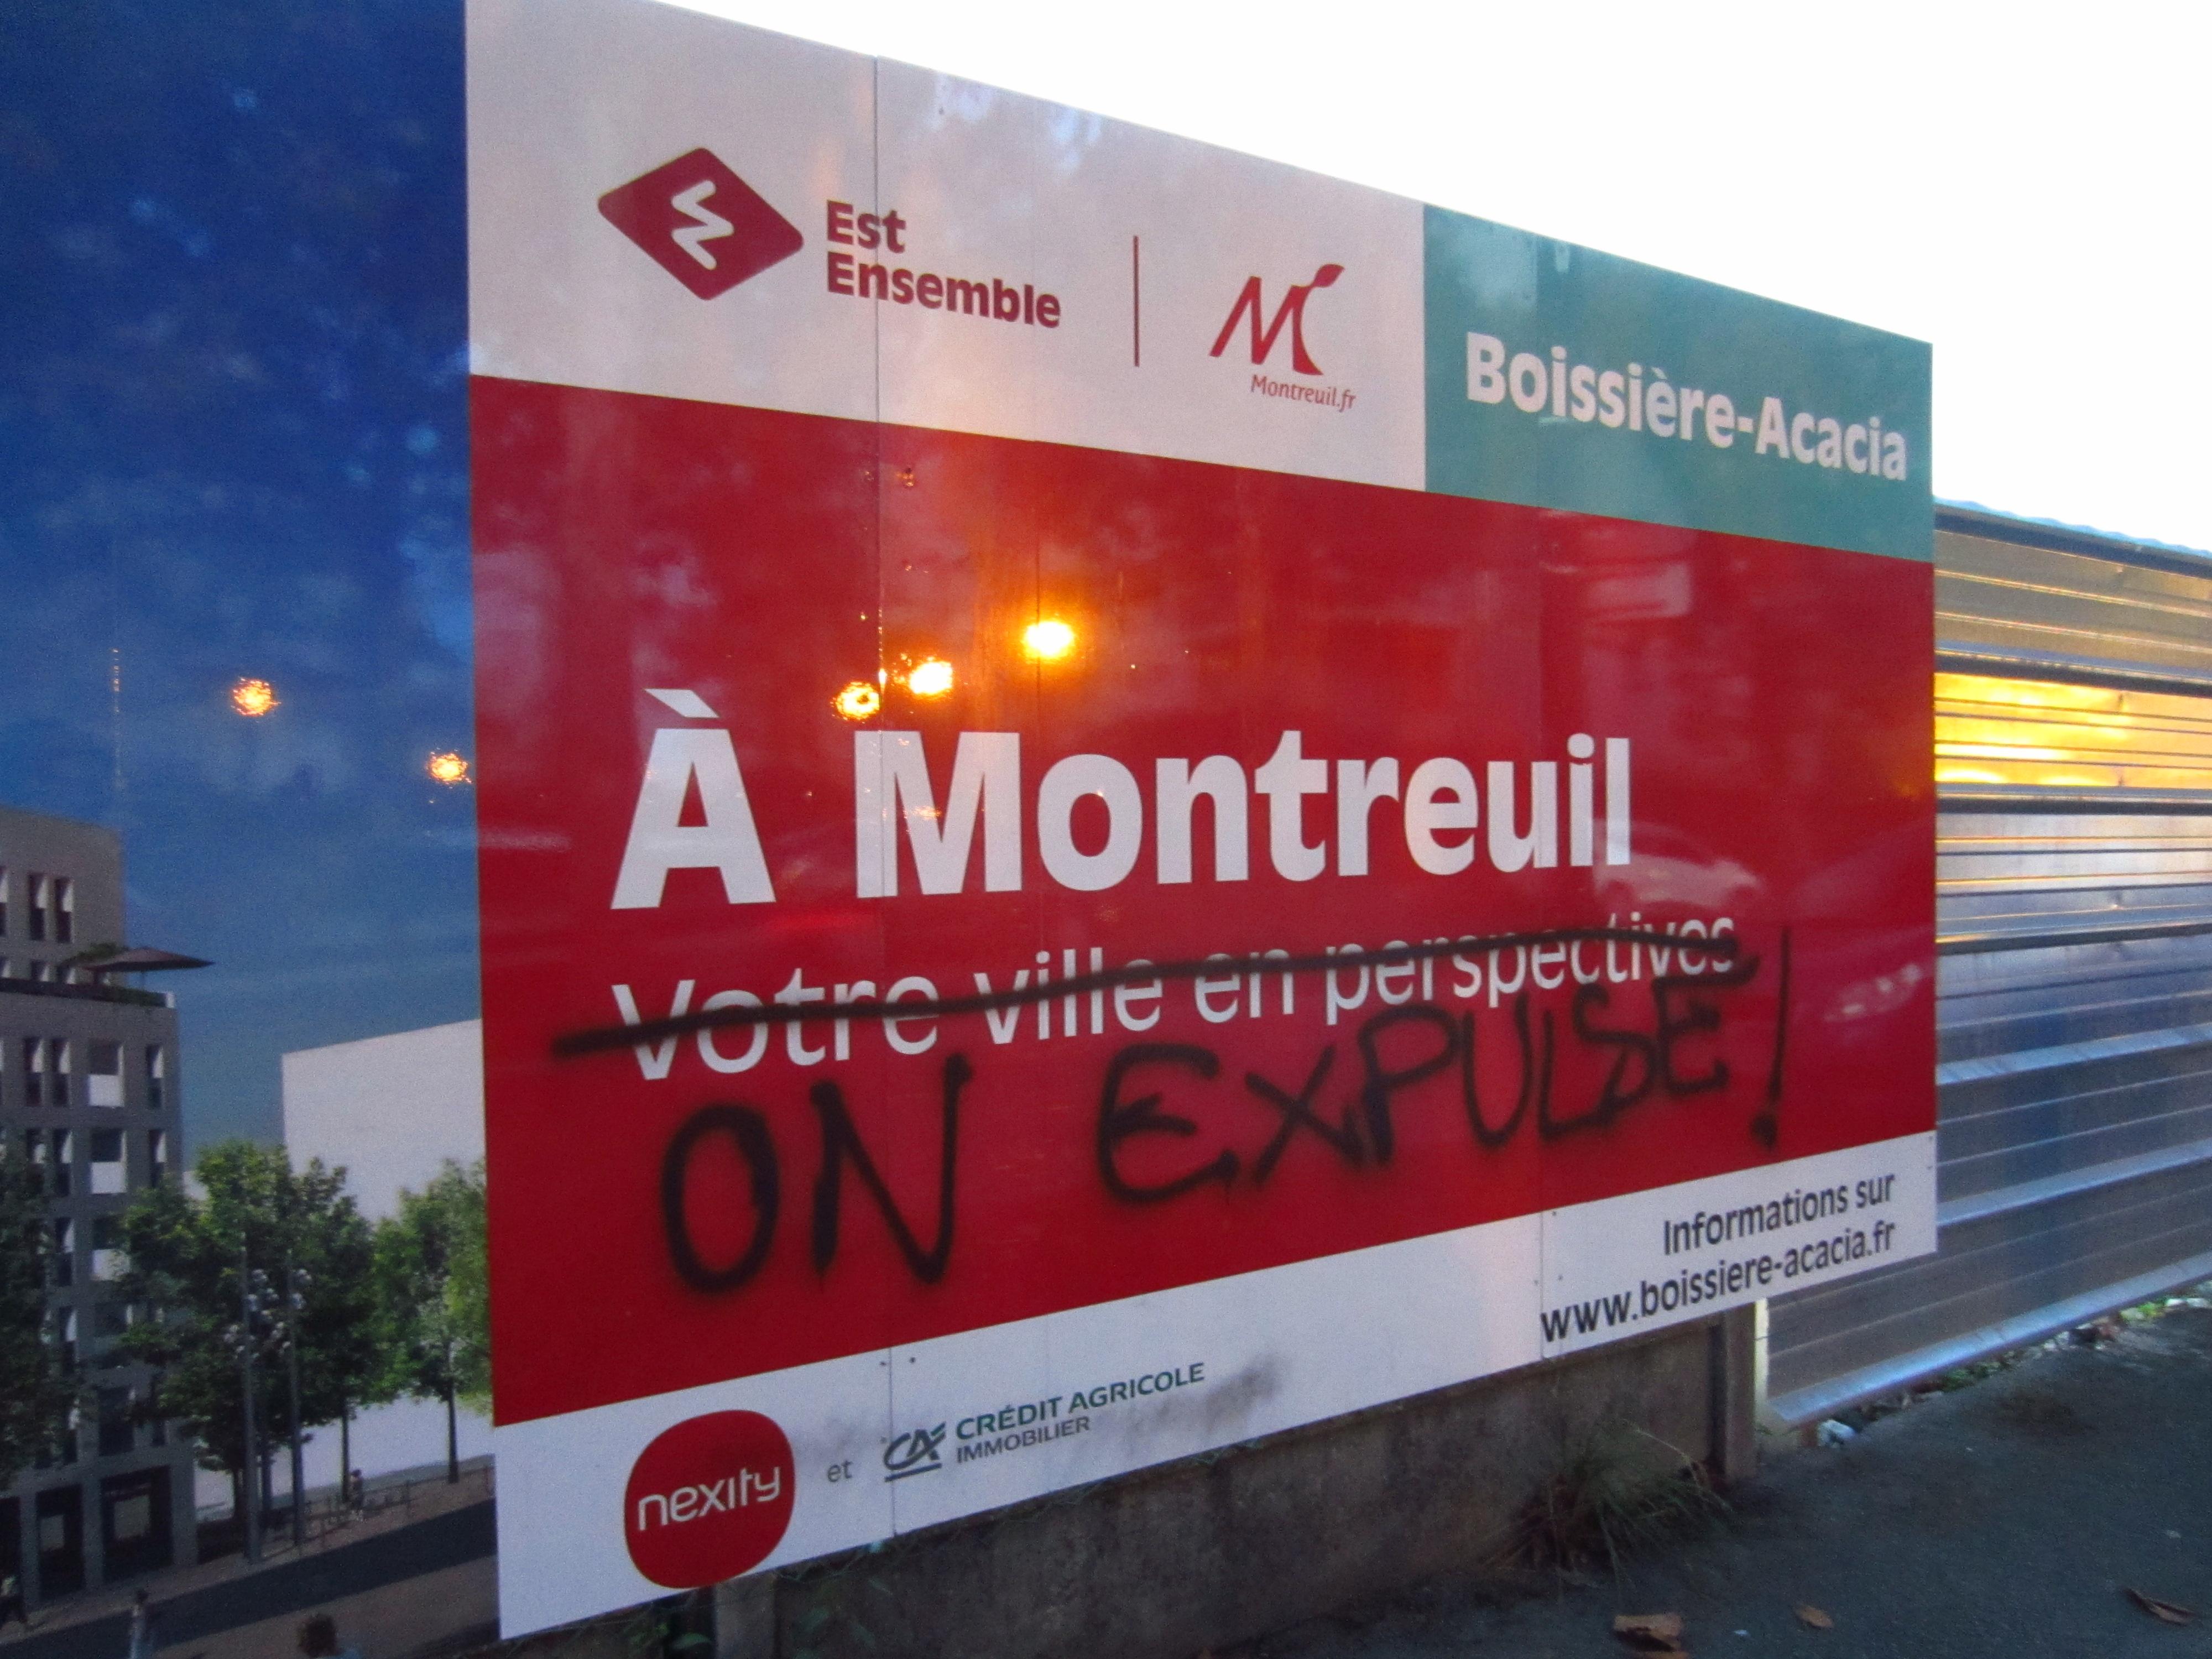 2015-10-30_Montreuil_LaBoissiere-70-Nexity